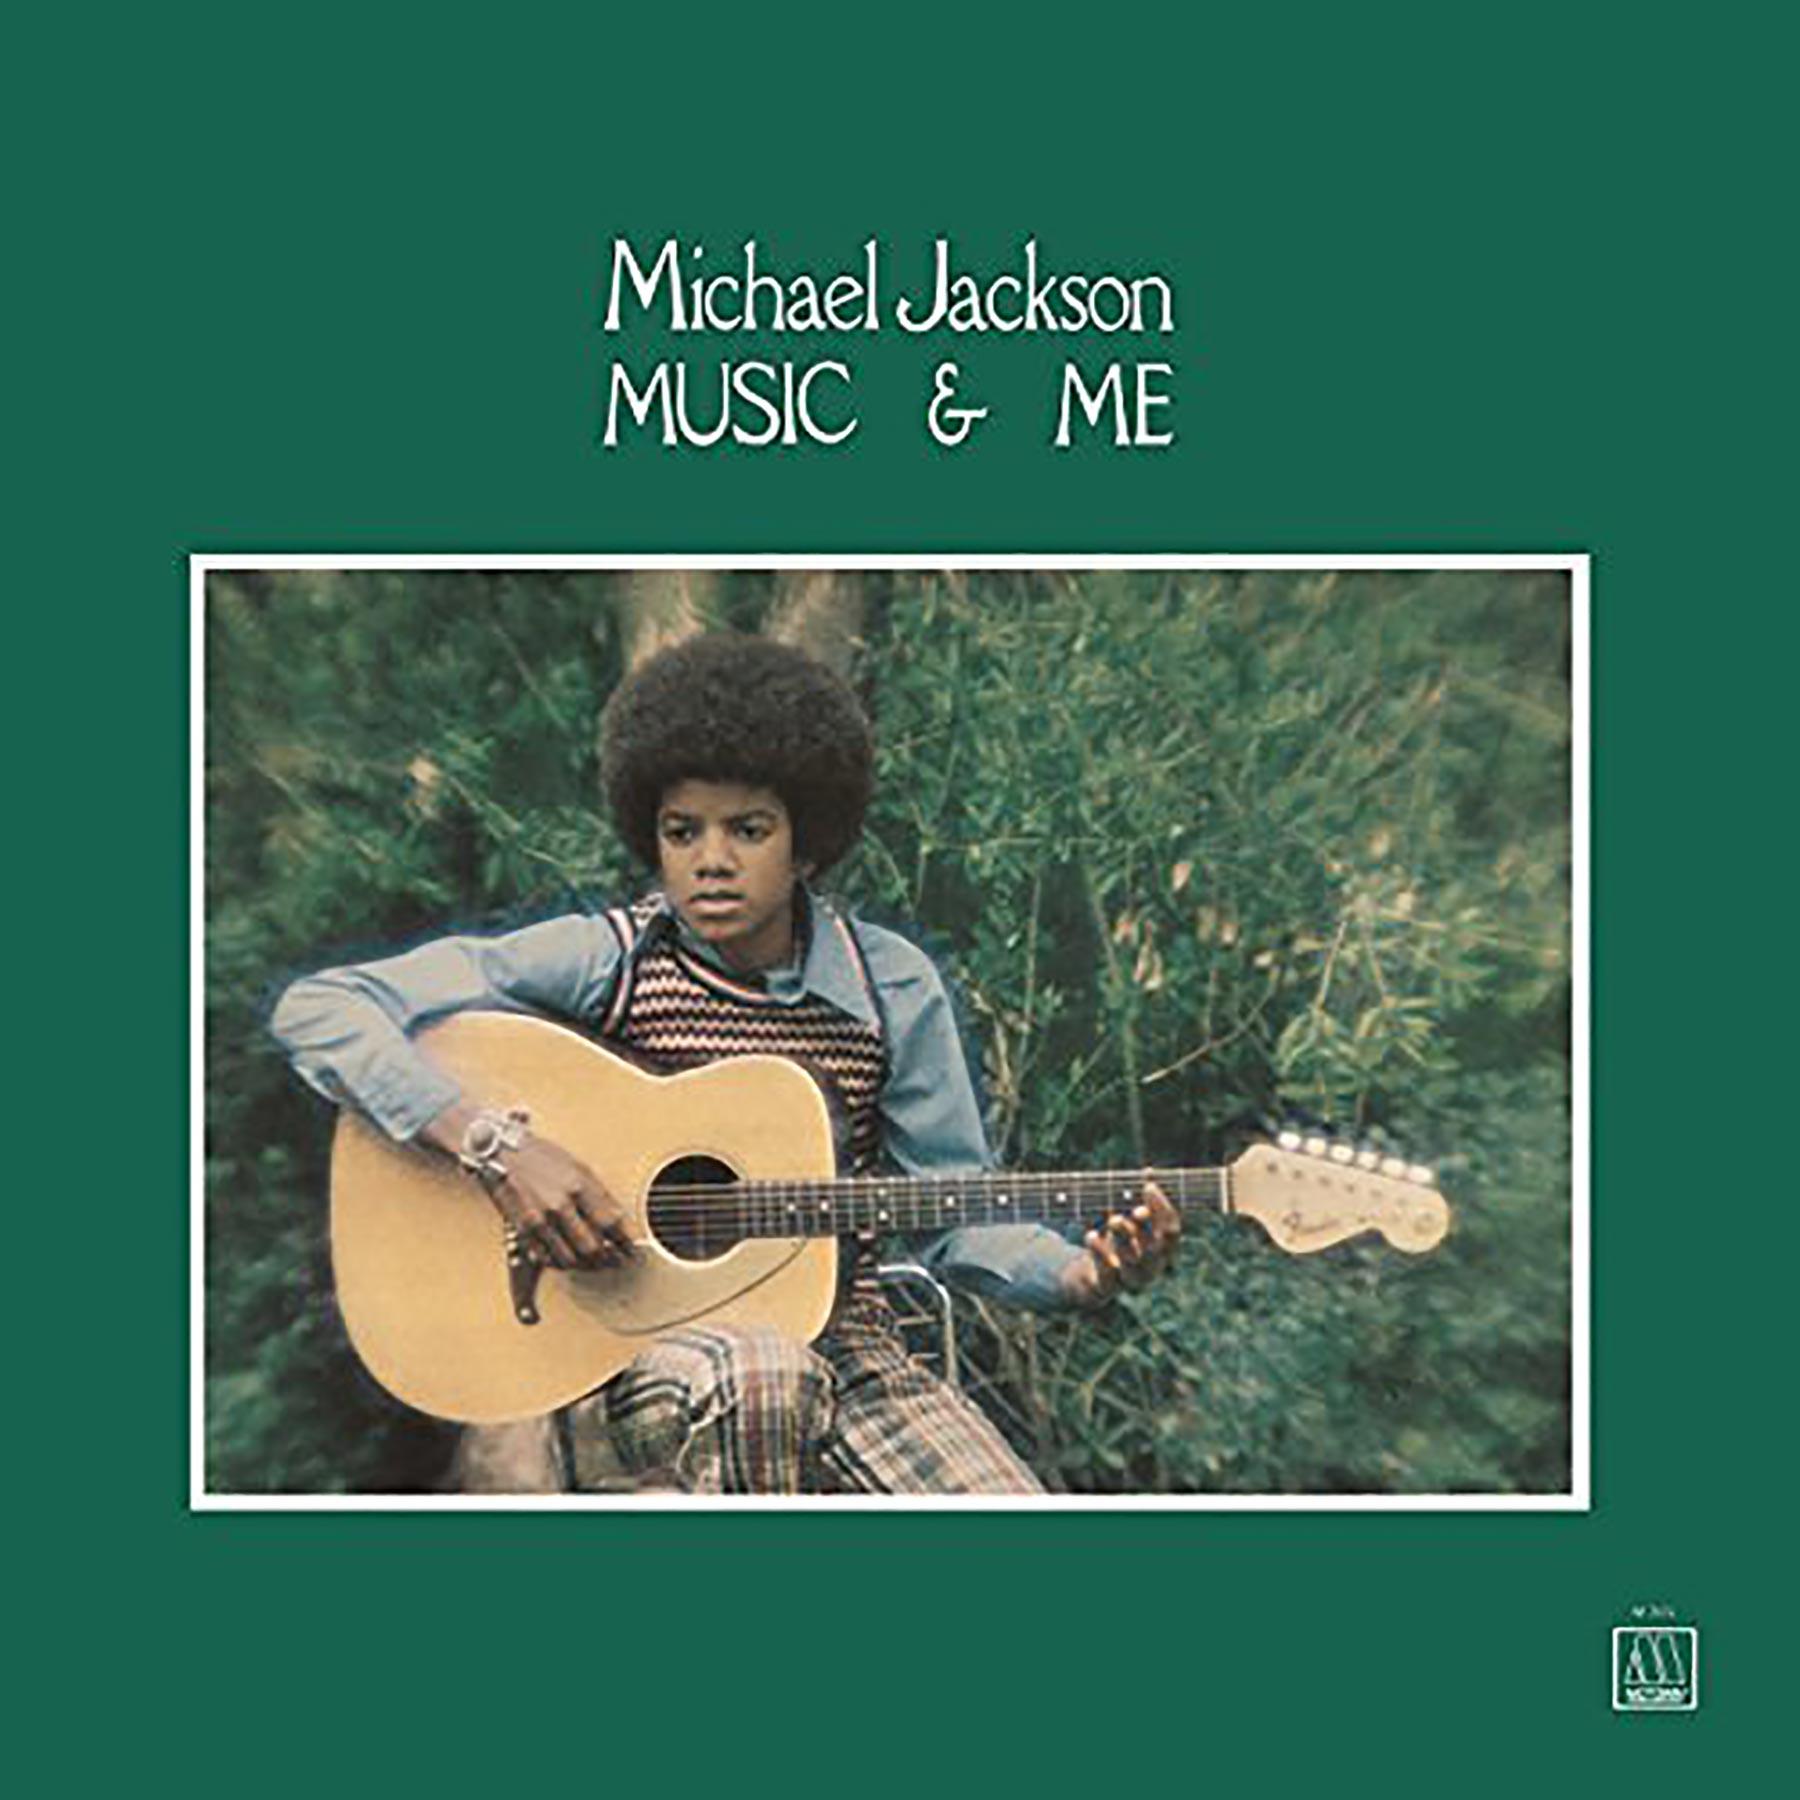 Music & Me (1973) by Michael Jackson